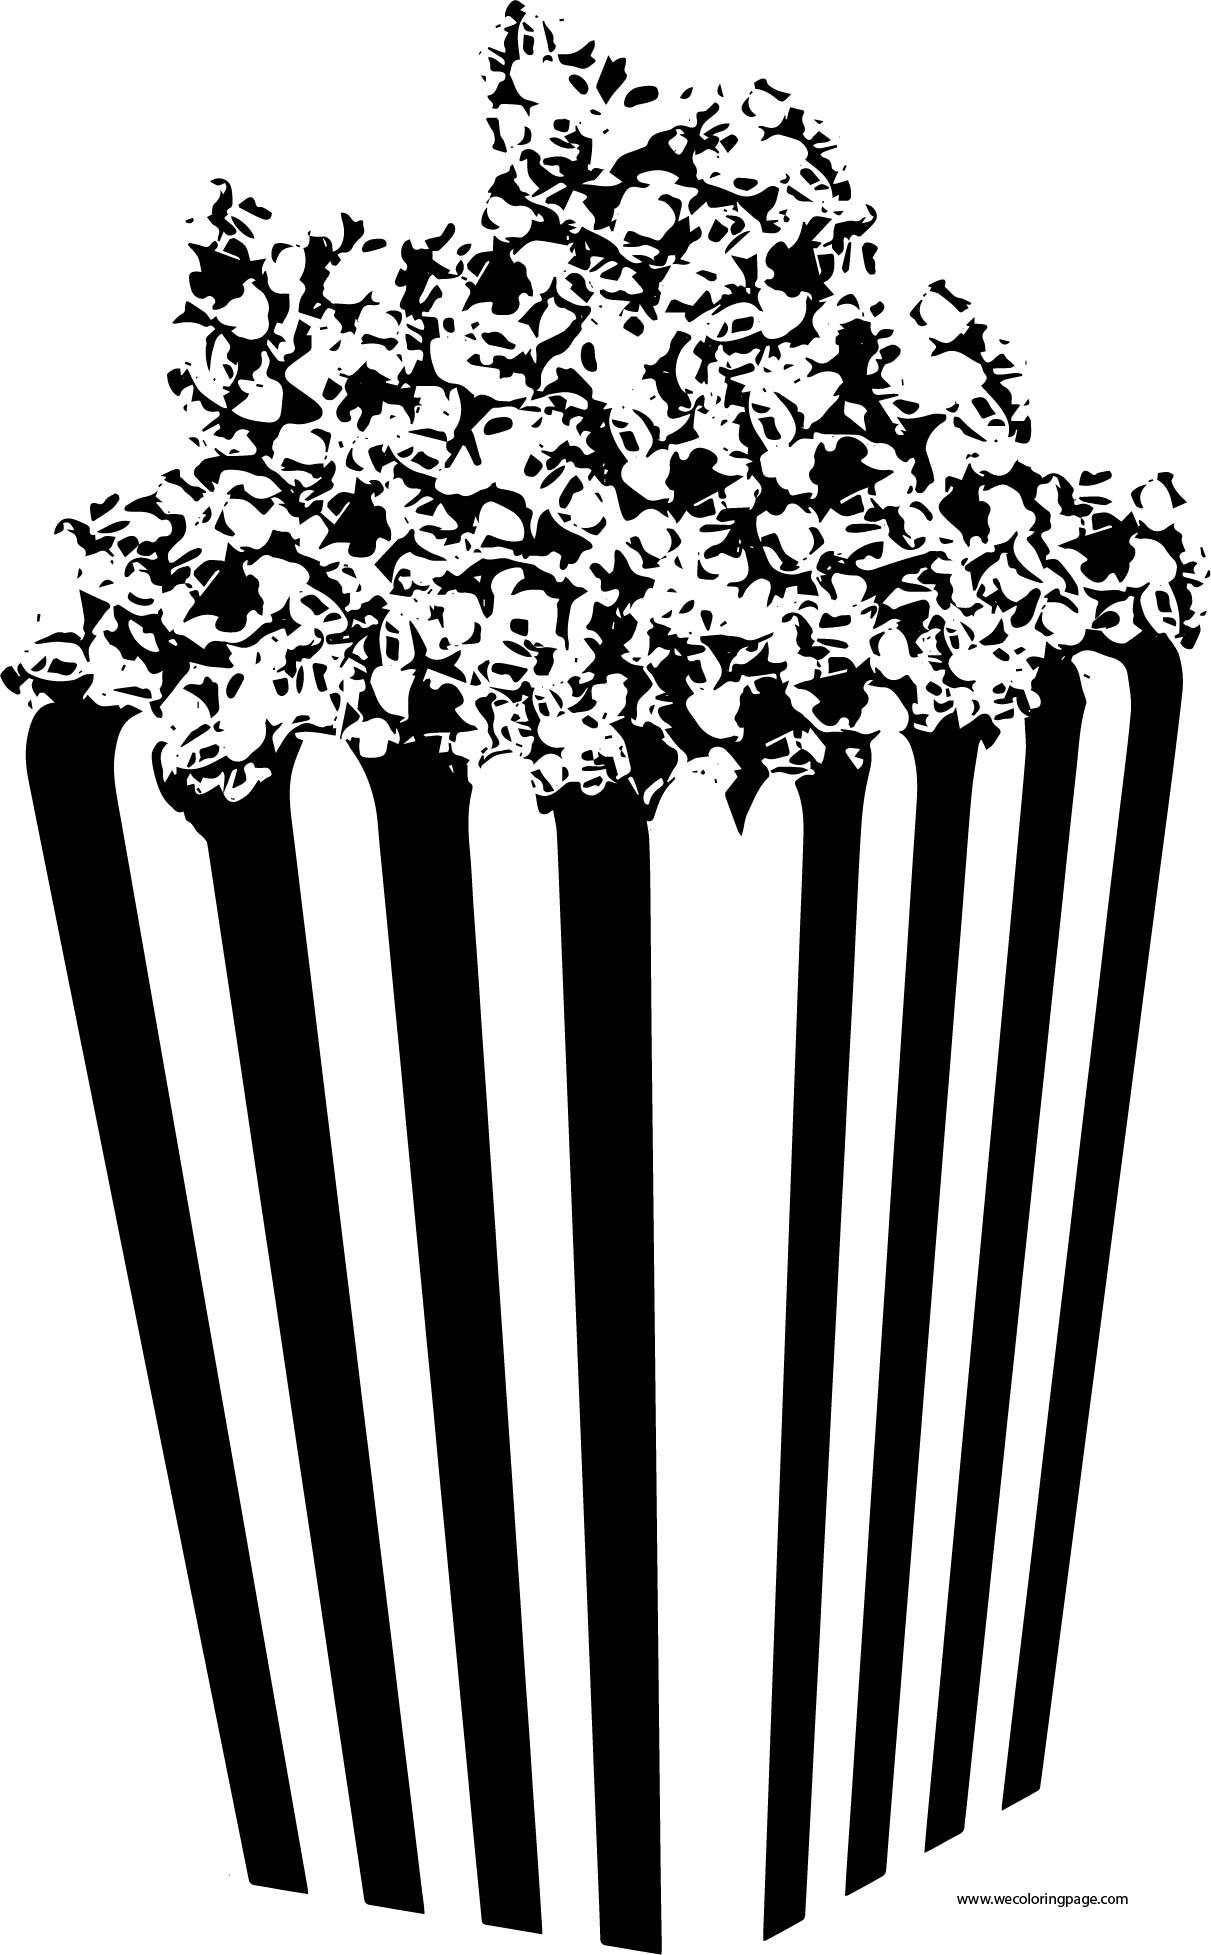 Popcorn Box Black White Coloring Page